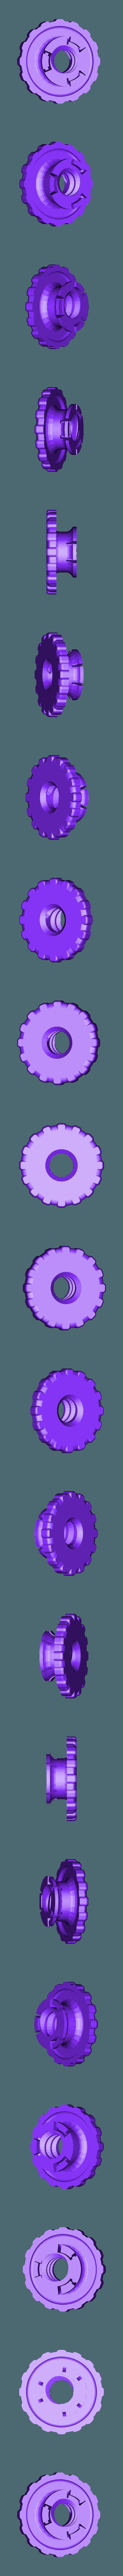 MiniFloss - Spool.stl Download free STL file MiniFloss • 3D printer object, clockspring